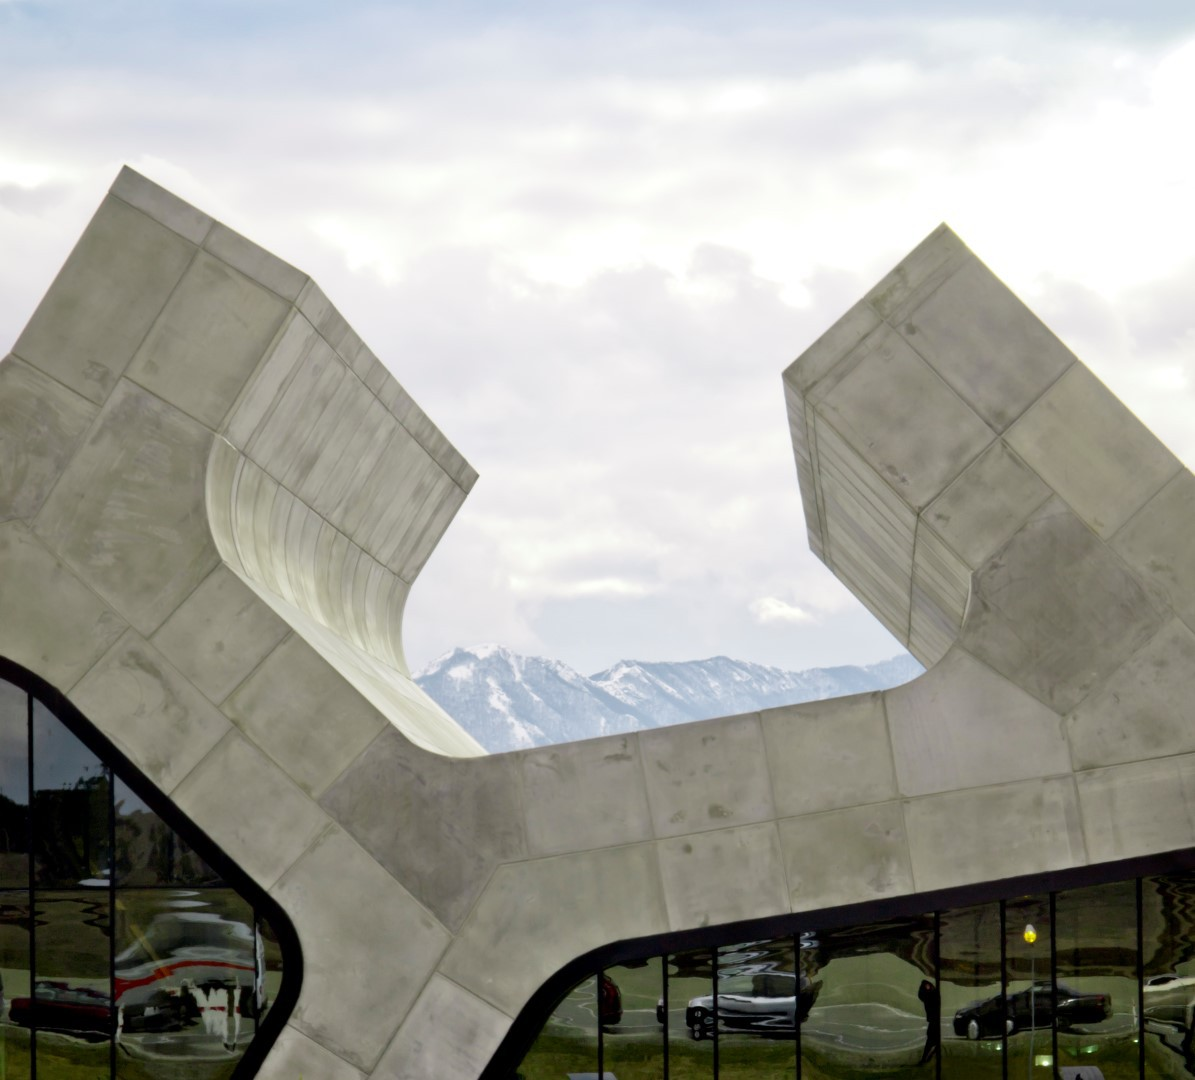 Architect Jürgen Mayer H. - The Luxury Collection Montenegro magazine